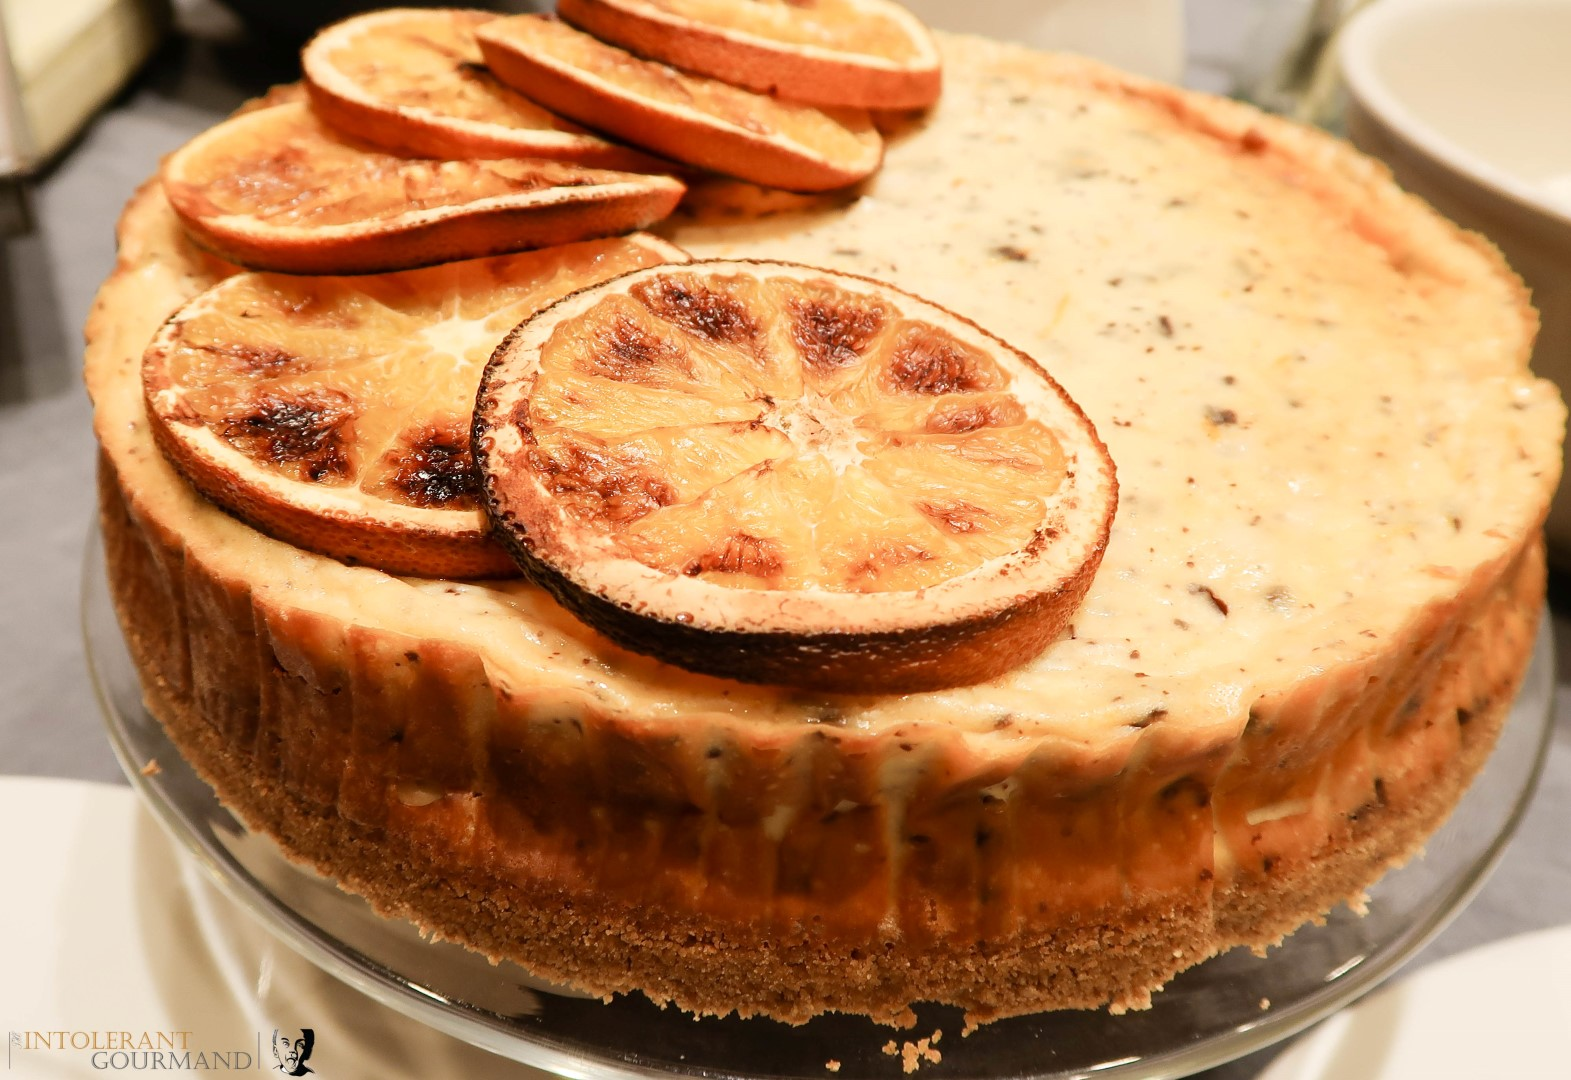 The Intolerant Gourmand - Splenda Sweet School - A Sugar ...